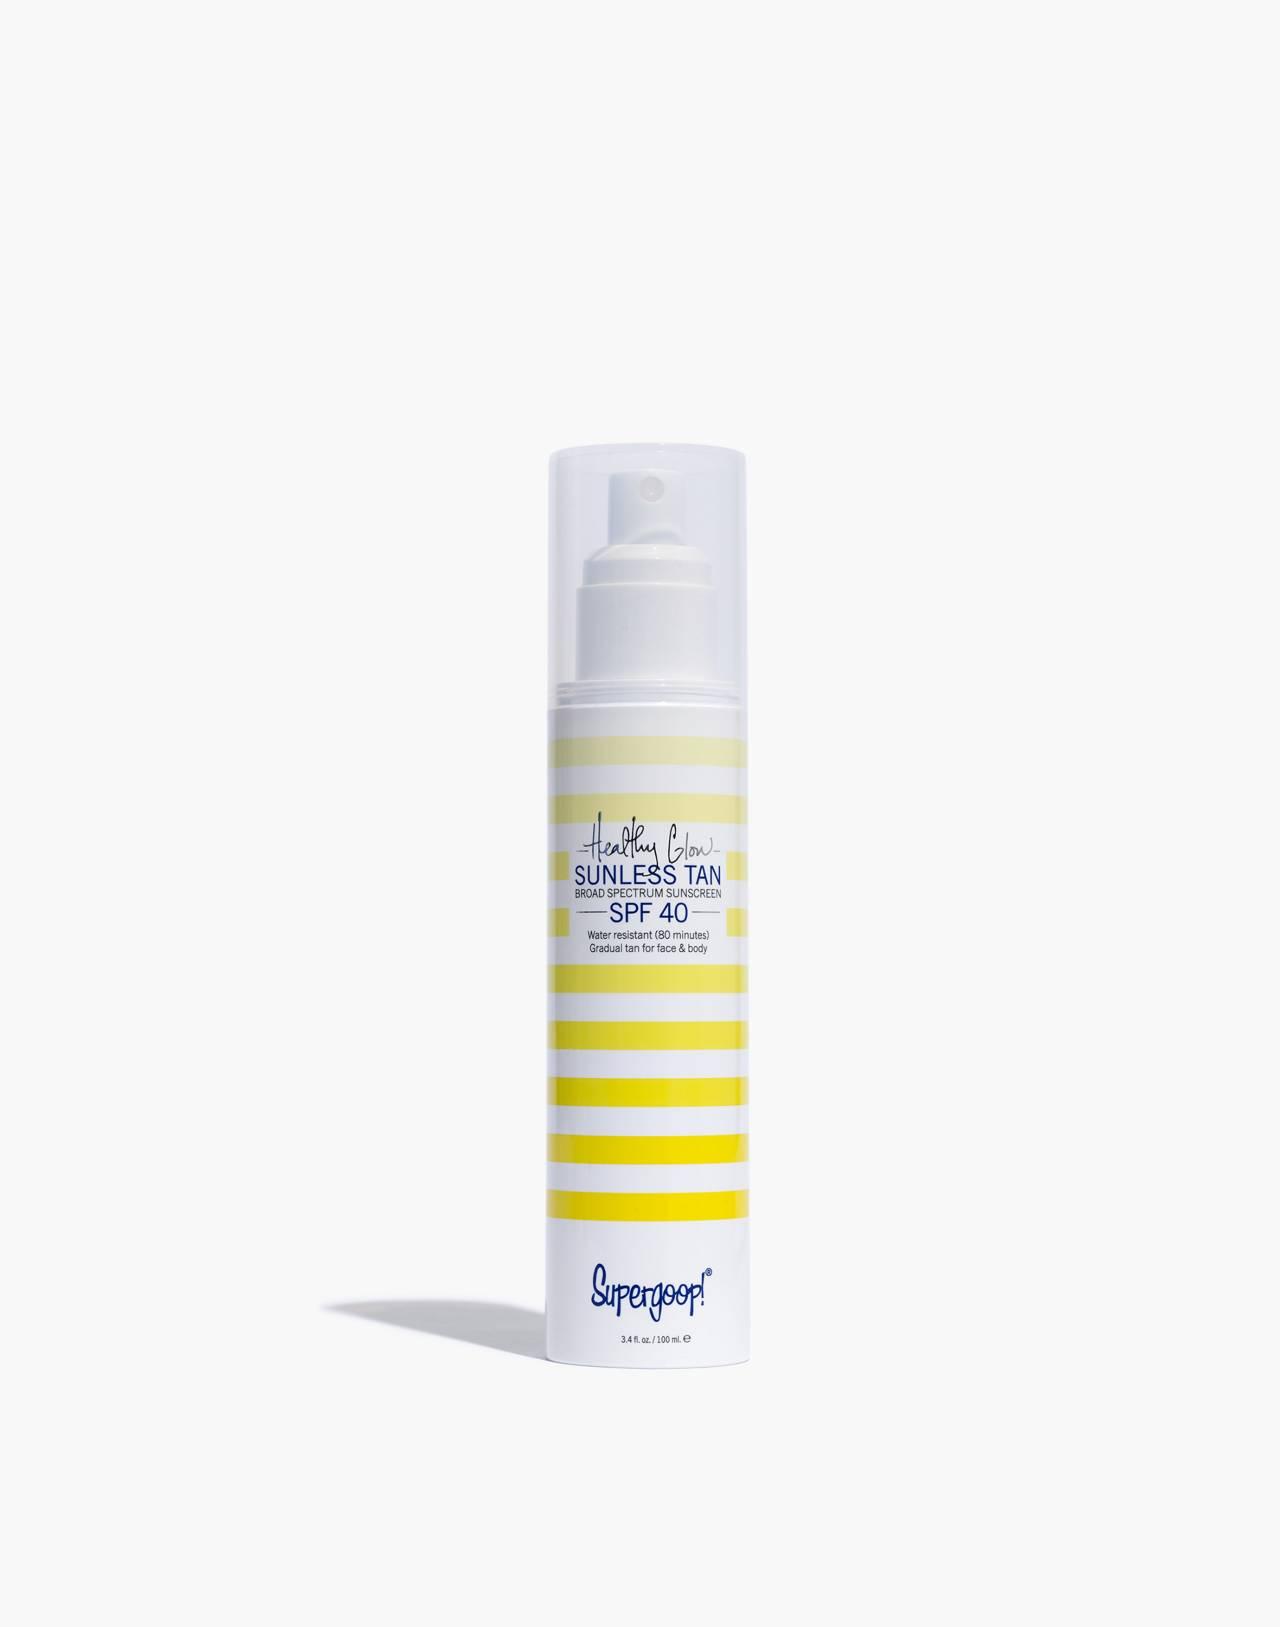 Supergoop!® Healthy Glow Sunless Tan in spf 40 image 1